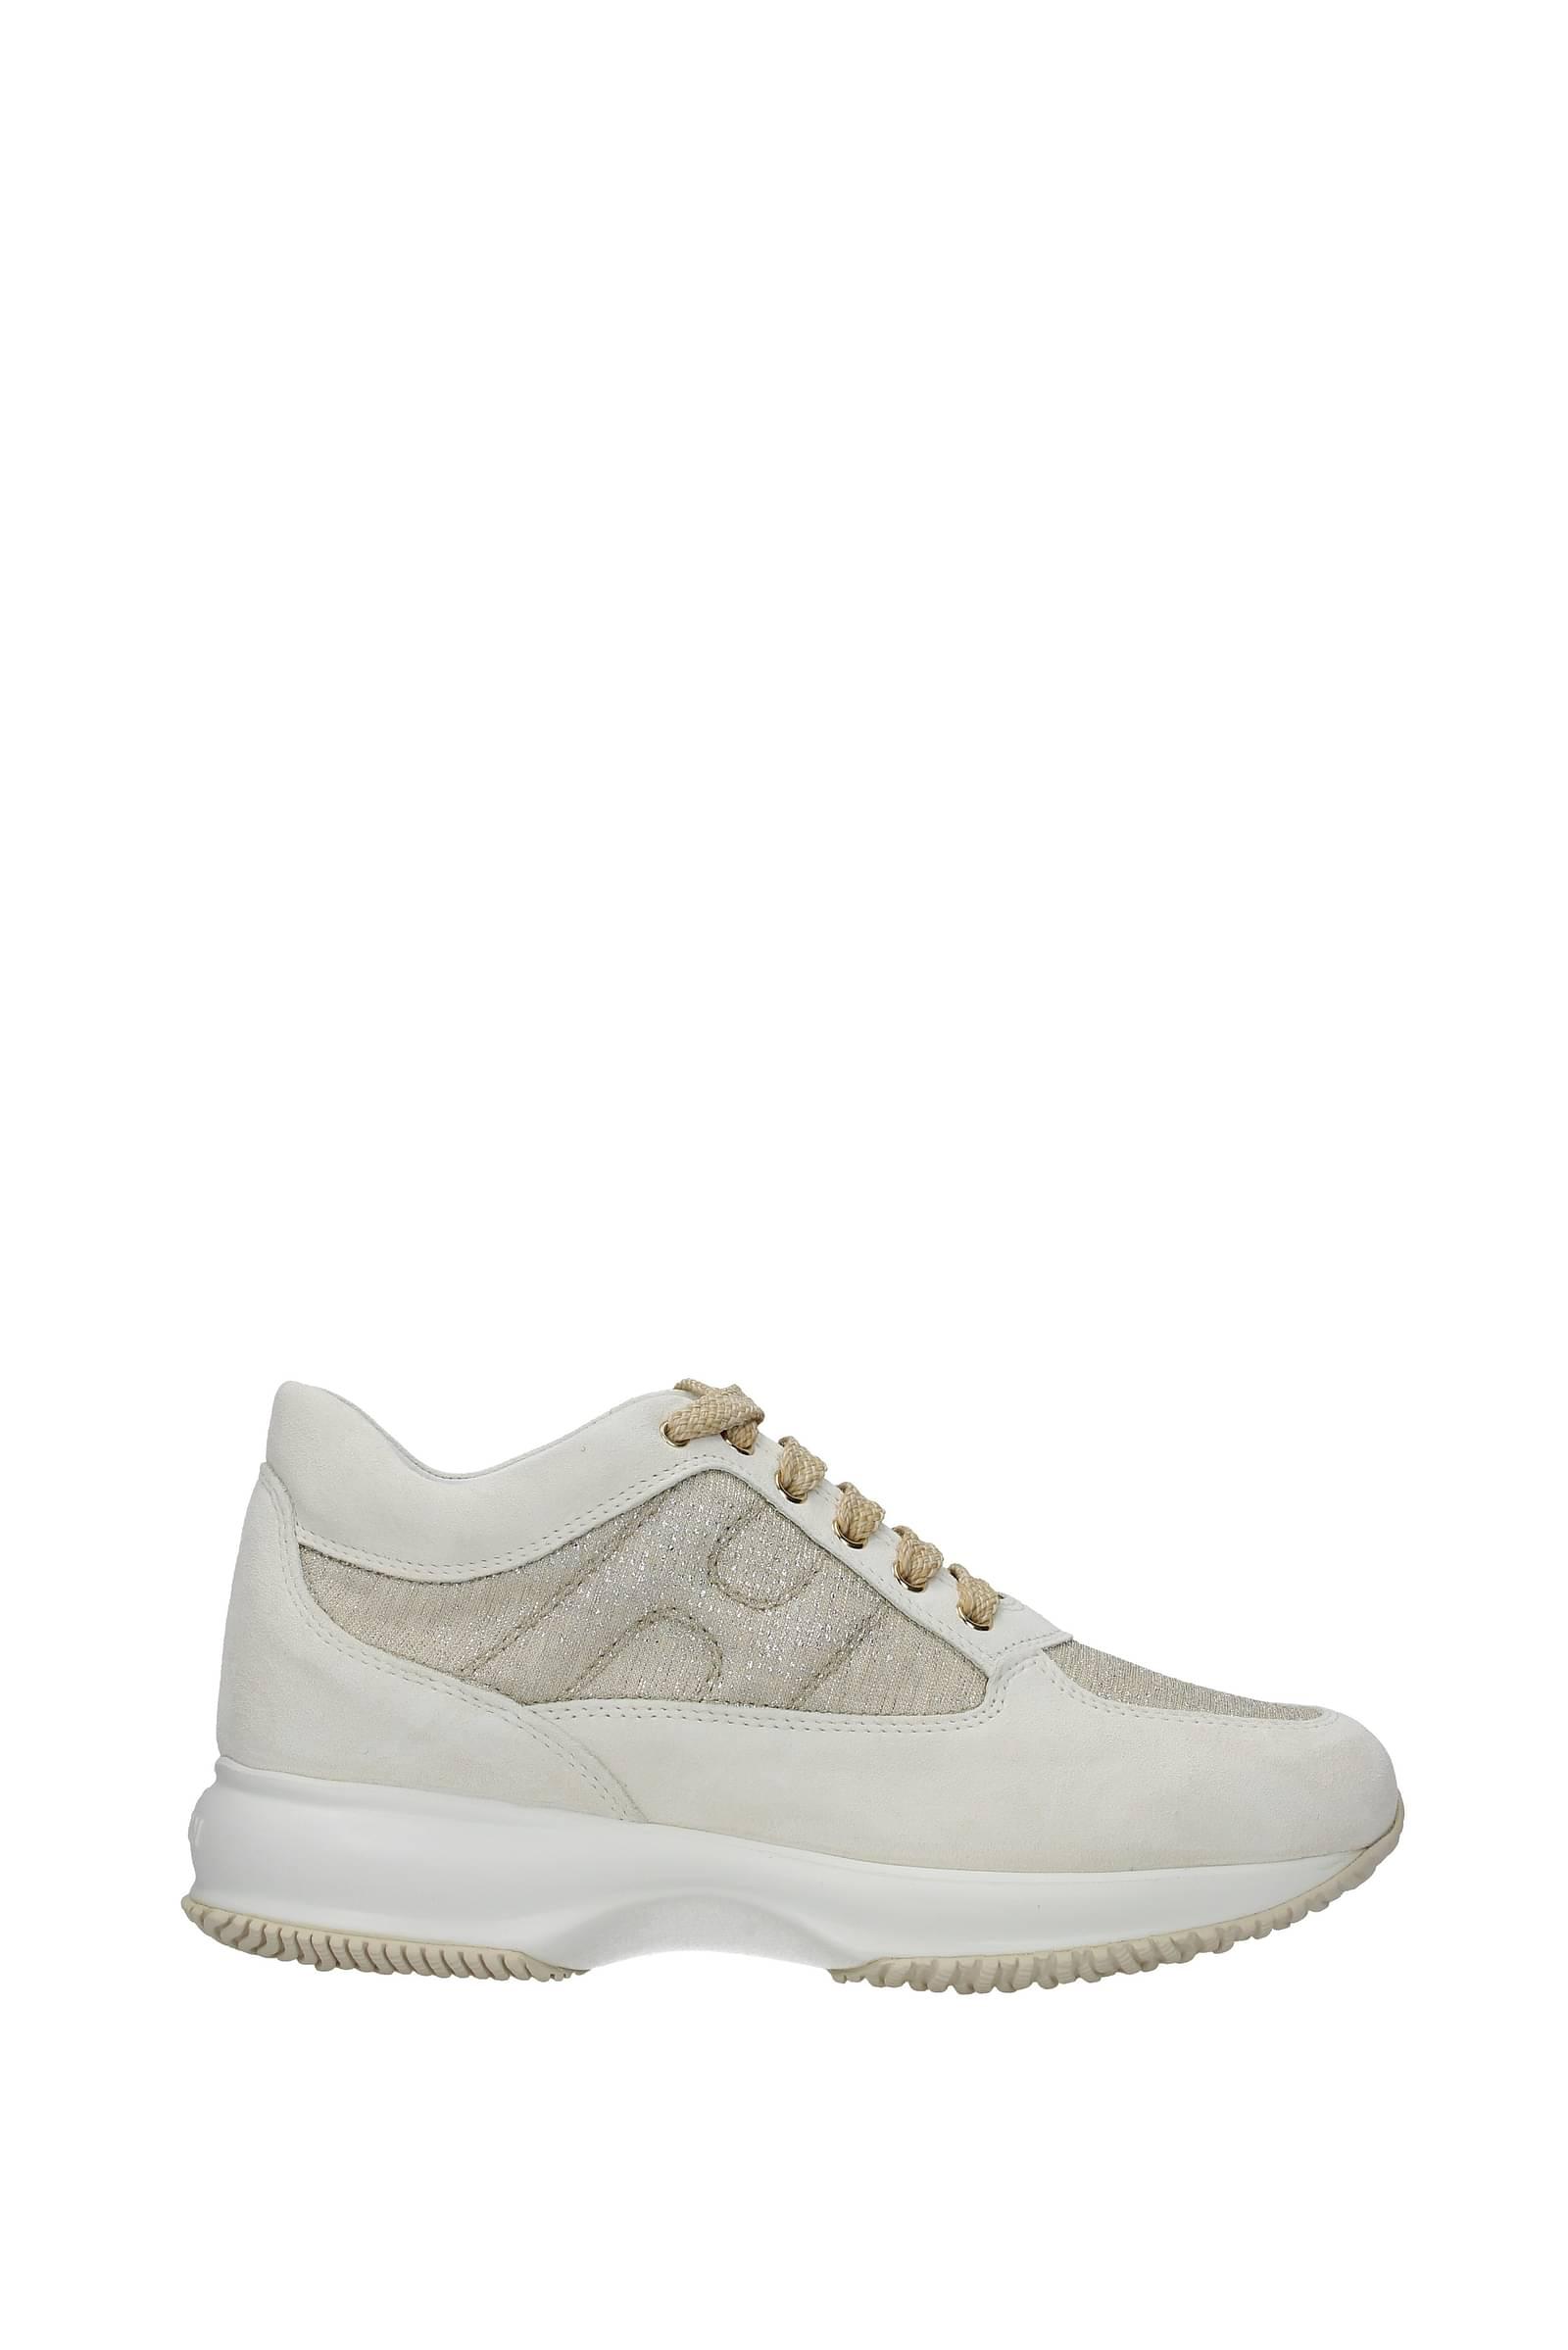 Hogan Sneakers Women HXW00N00E10MZ0ST00 Suede 147€